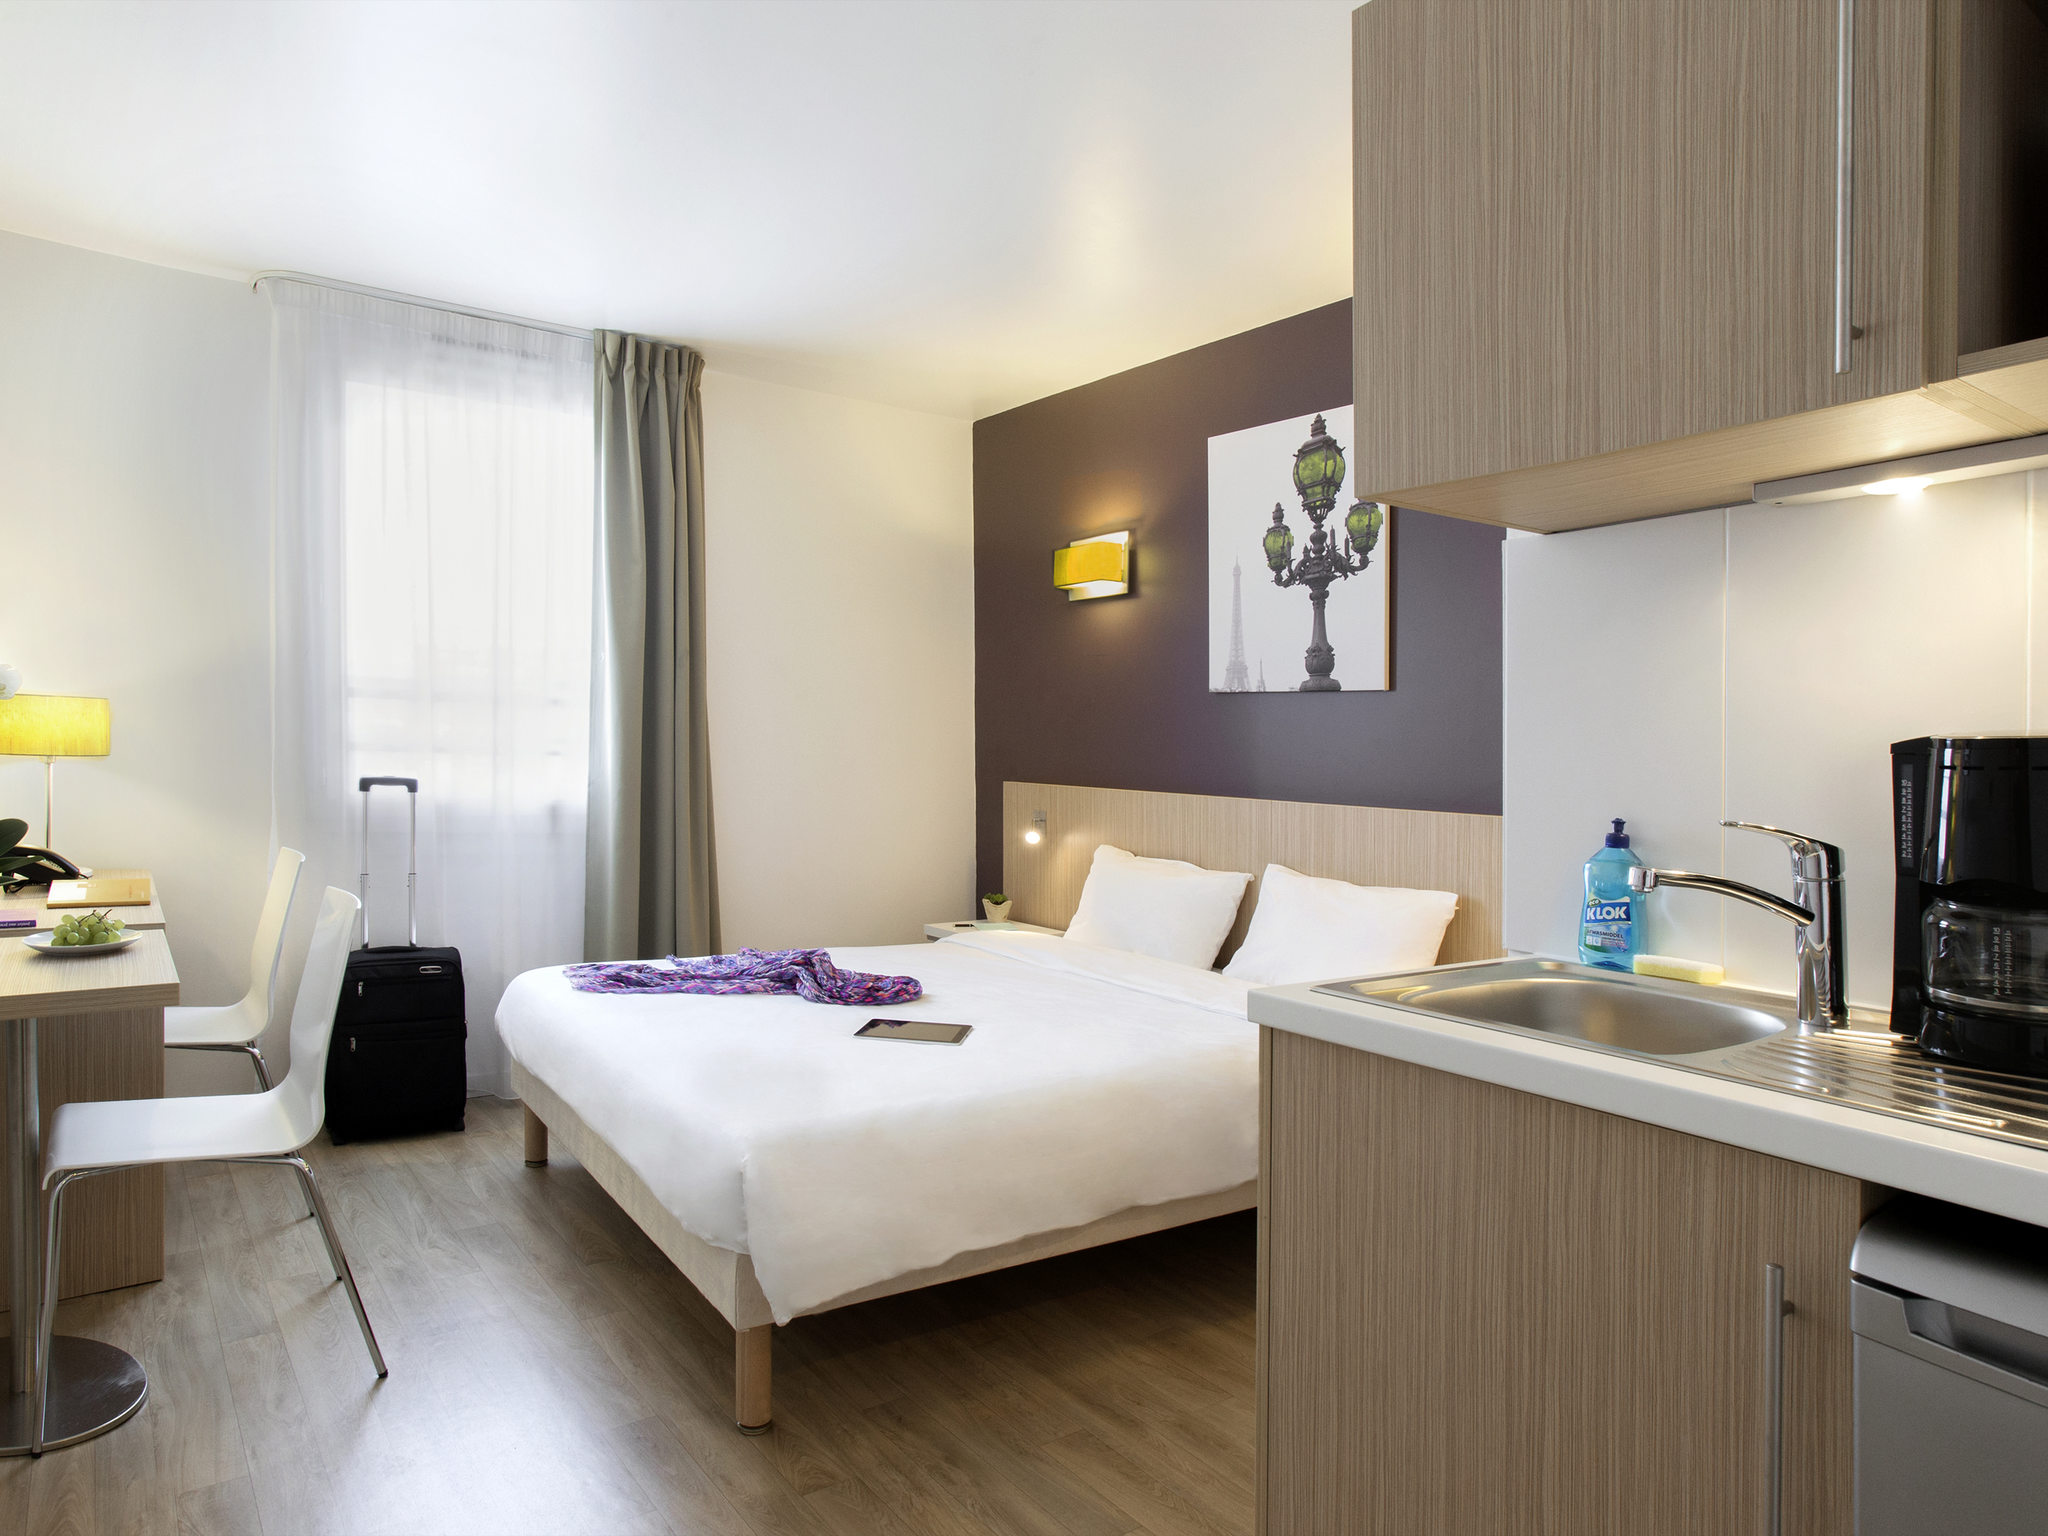 酒店 – Aparthotel Adagio access 巴黎克利希酒店